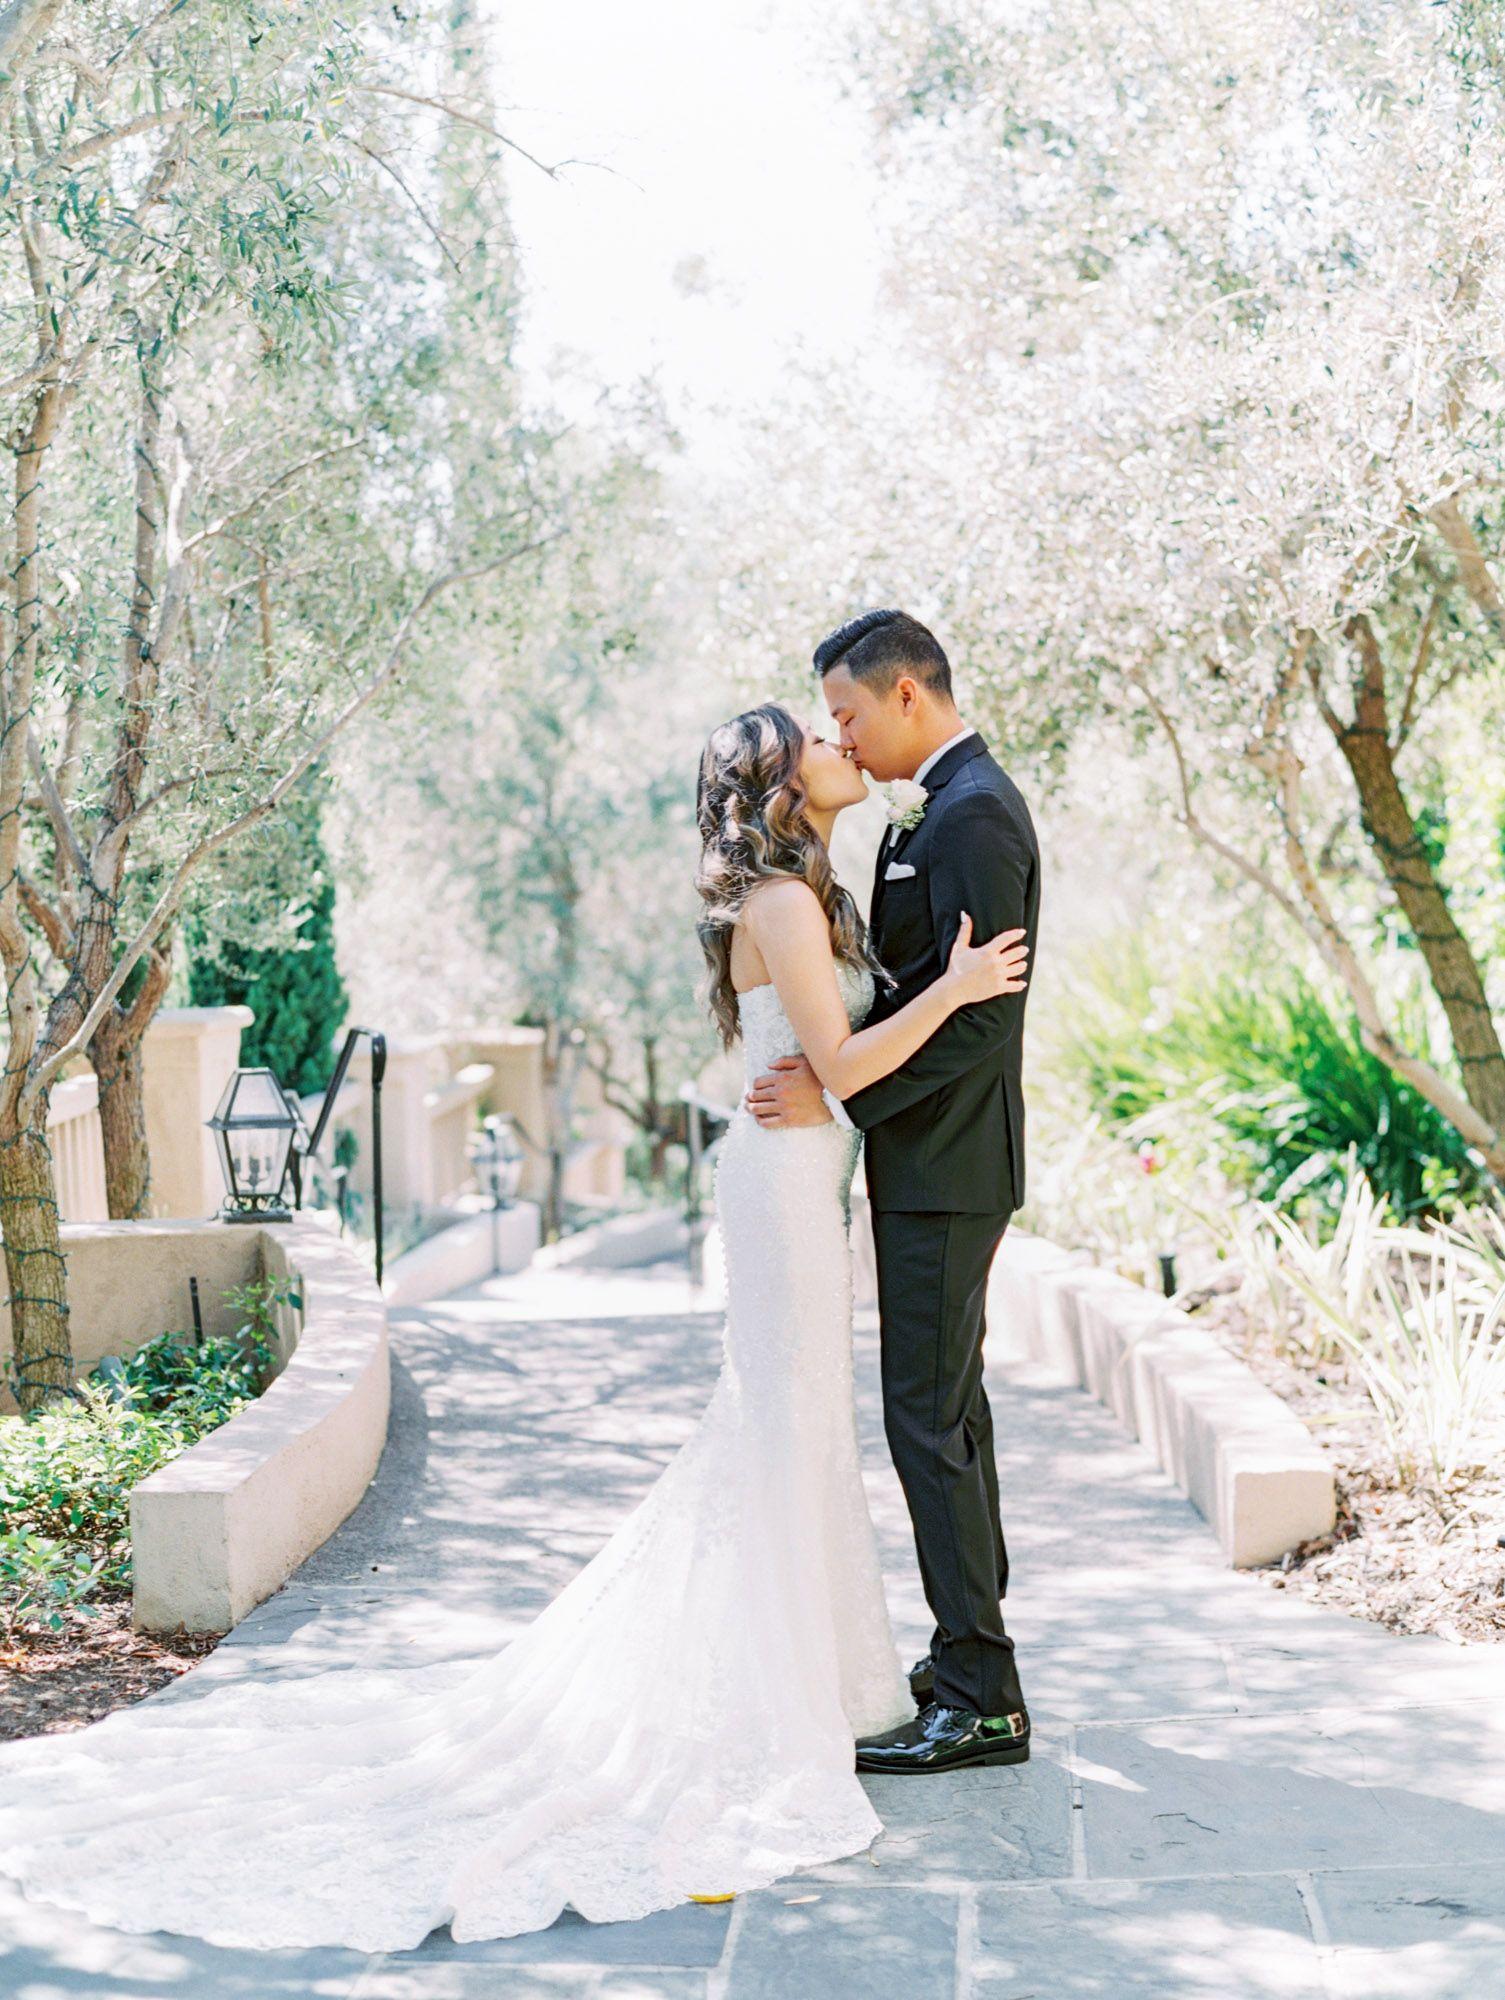 Esther + Yoon's Garden Wedding in 2020 | San diego wedding ...